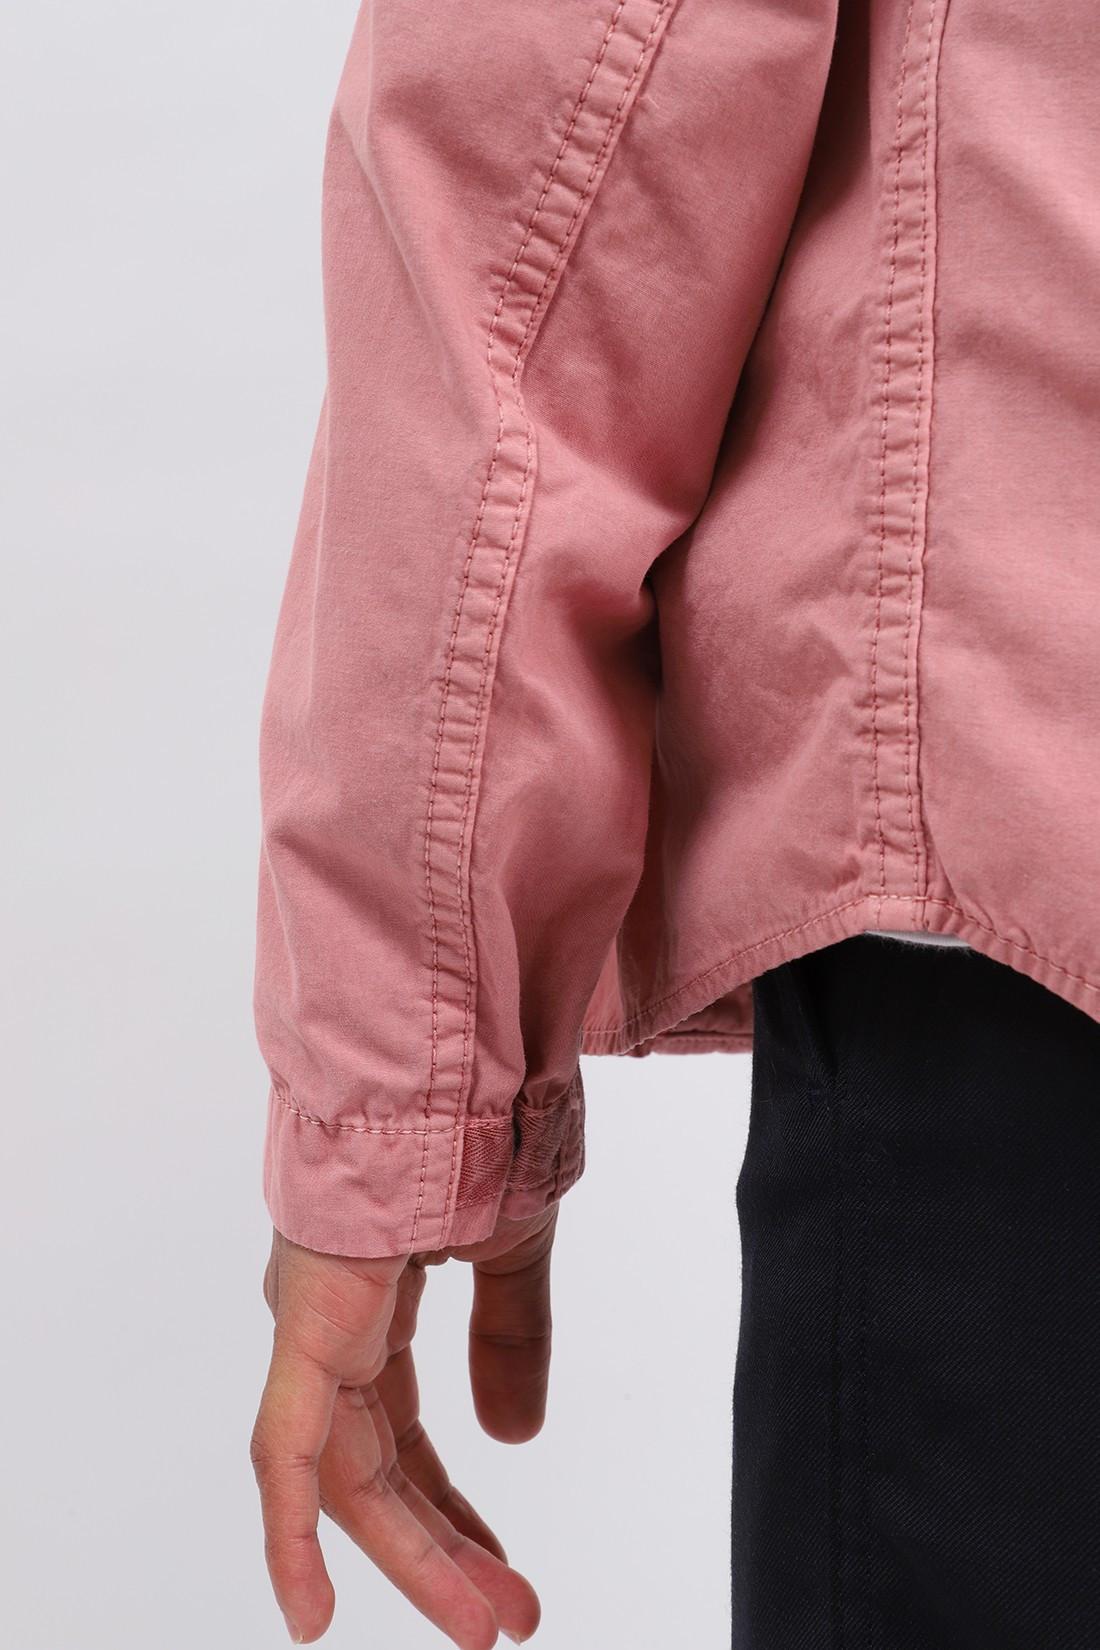 STONE ISLAND / 110wn overshirt v0186 Rosa quarzo